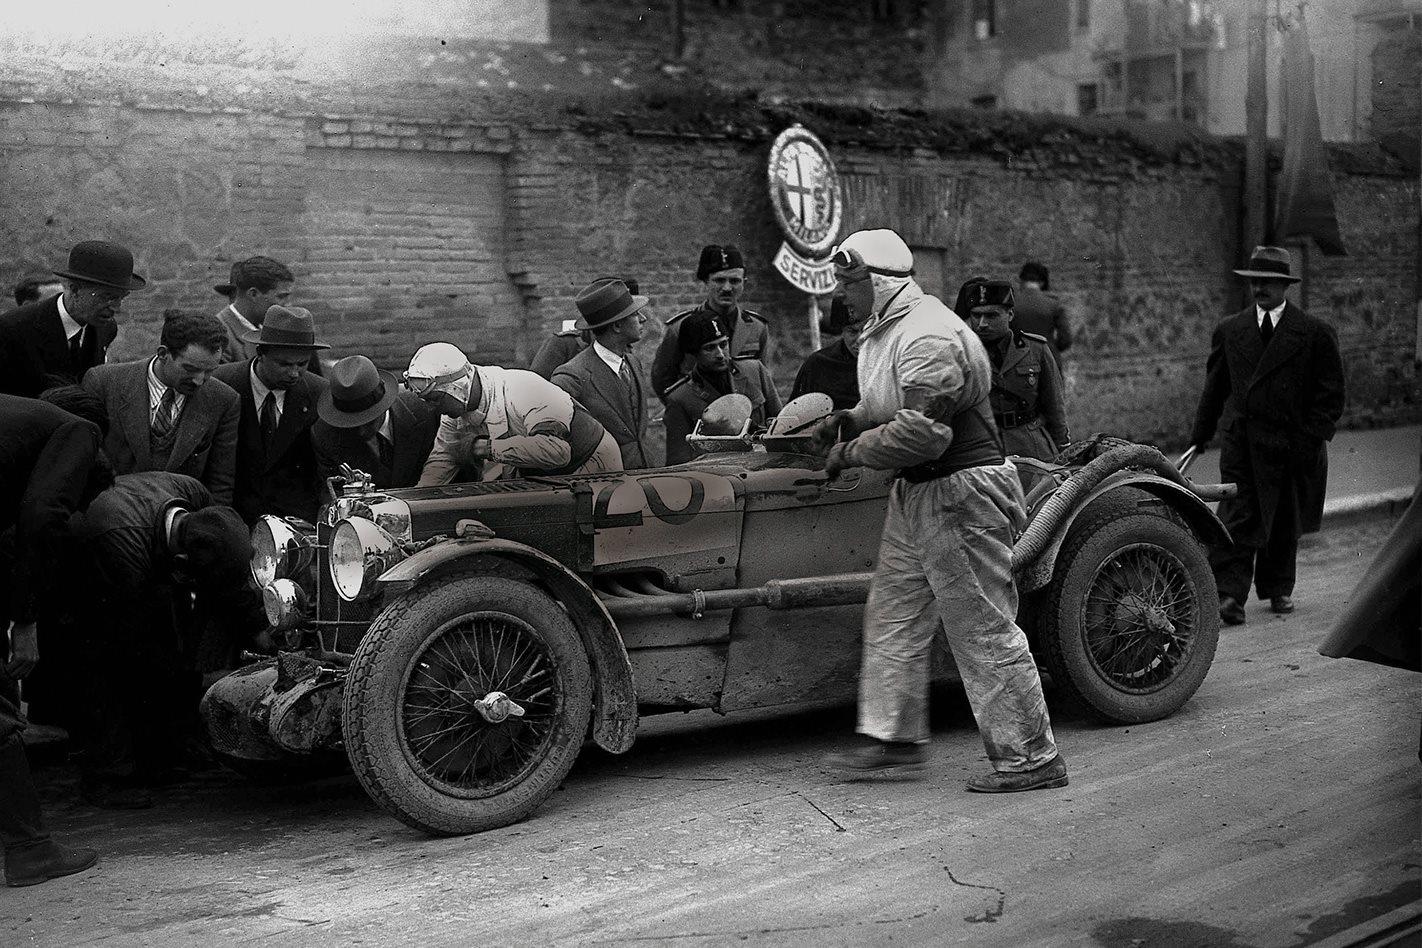 Targa Florio vehicles